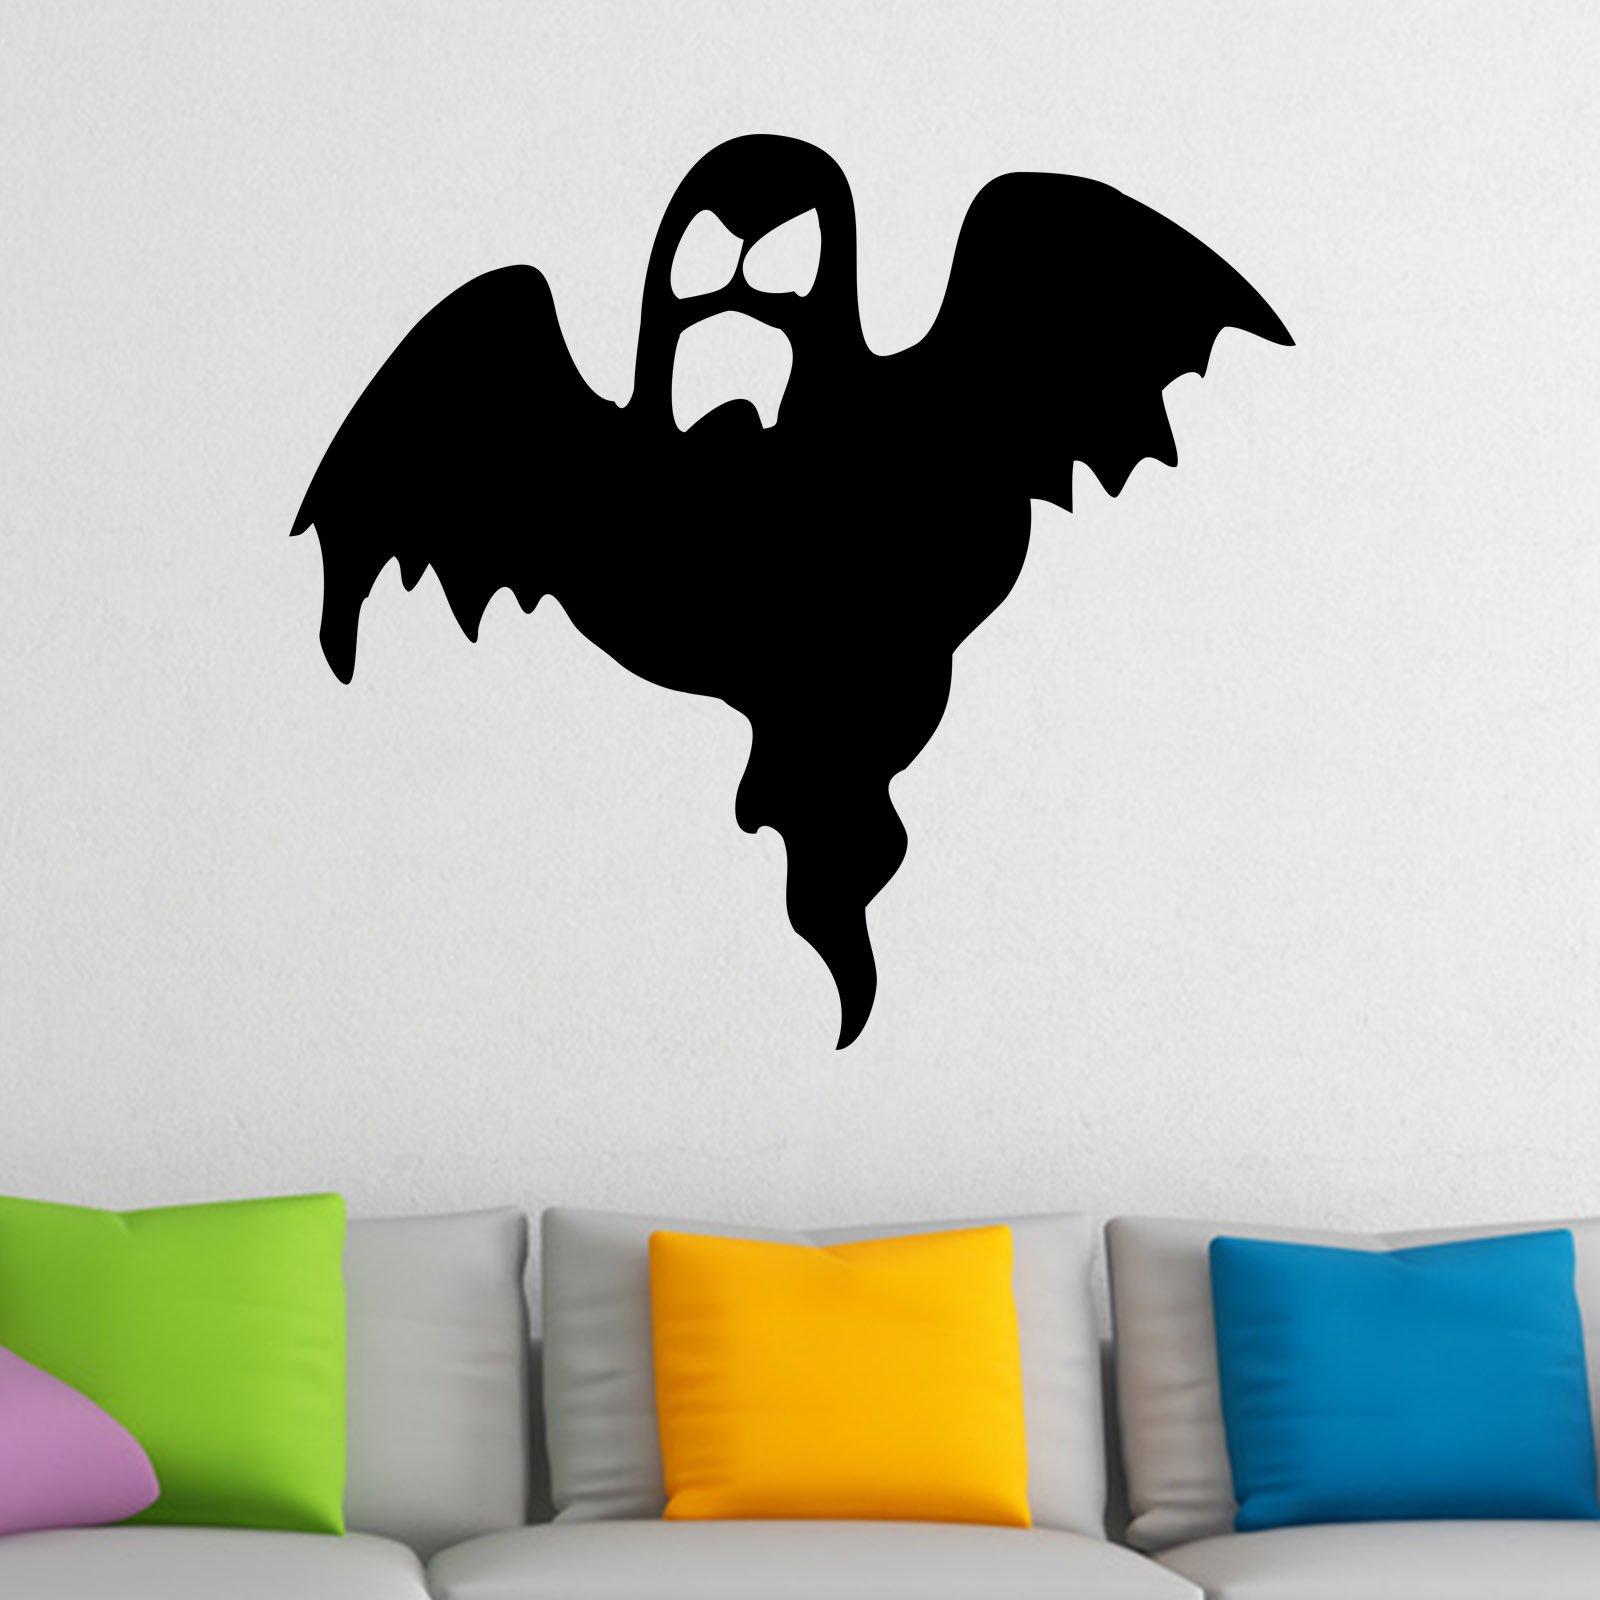 spooky ghost halloween wall sticker world of wall stickers